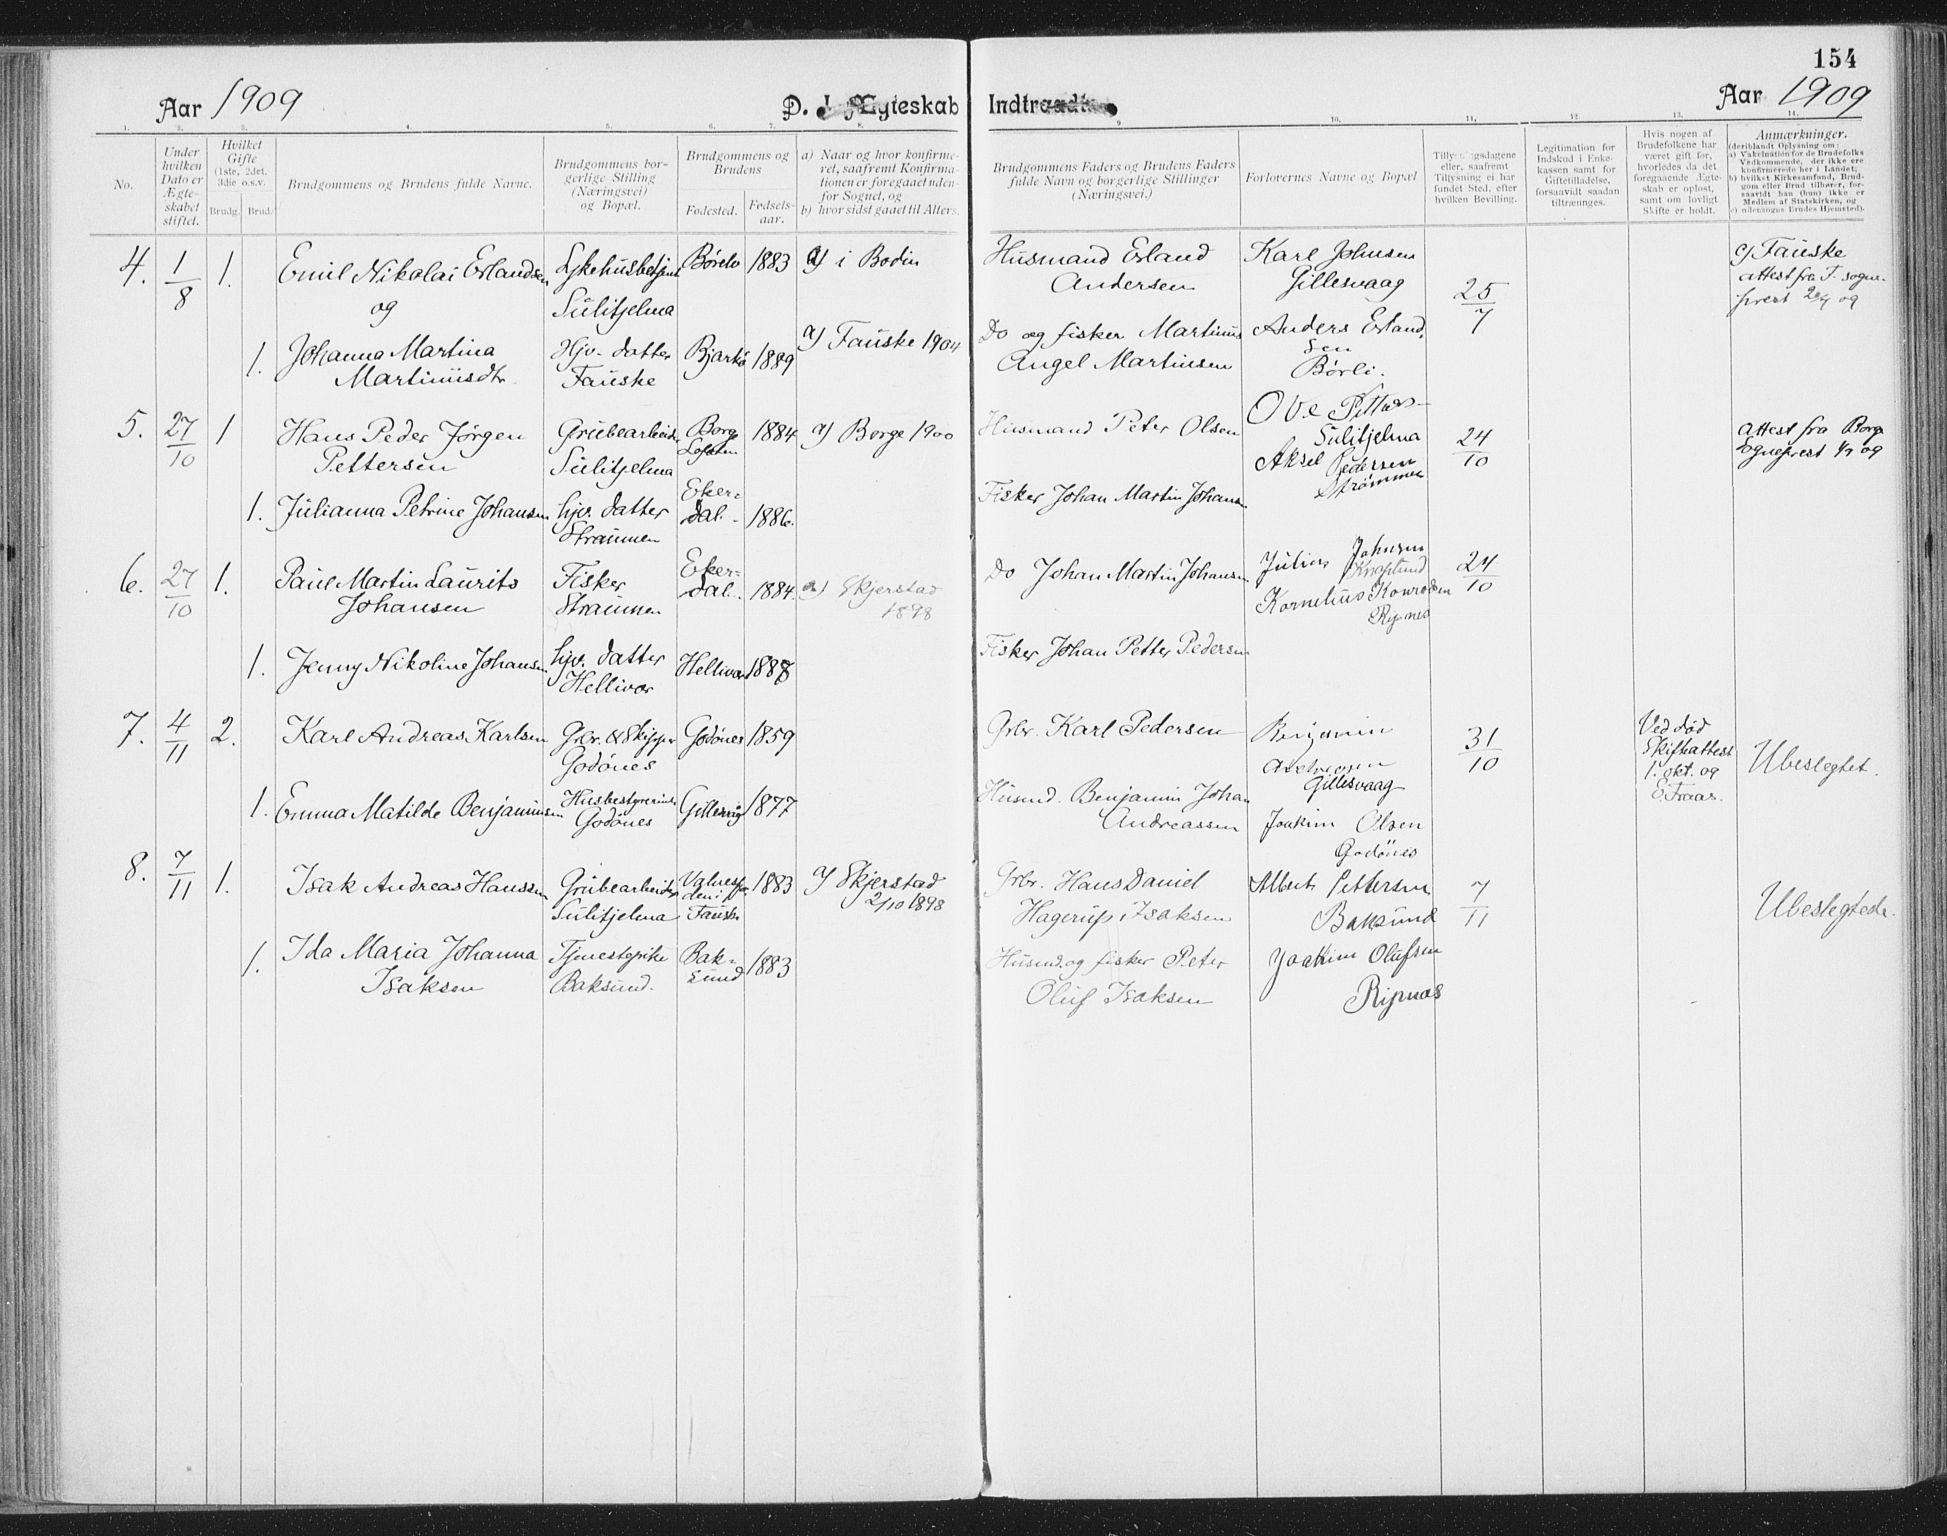 SAT, Ministerialprotokoller, klokkerbøker og fødselsregistre - Nordland, 804/L0081: Ministerialbok nr. 804A02, 1901-1915, s. 154